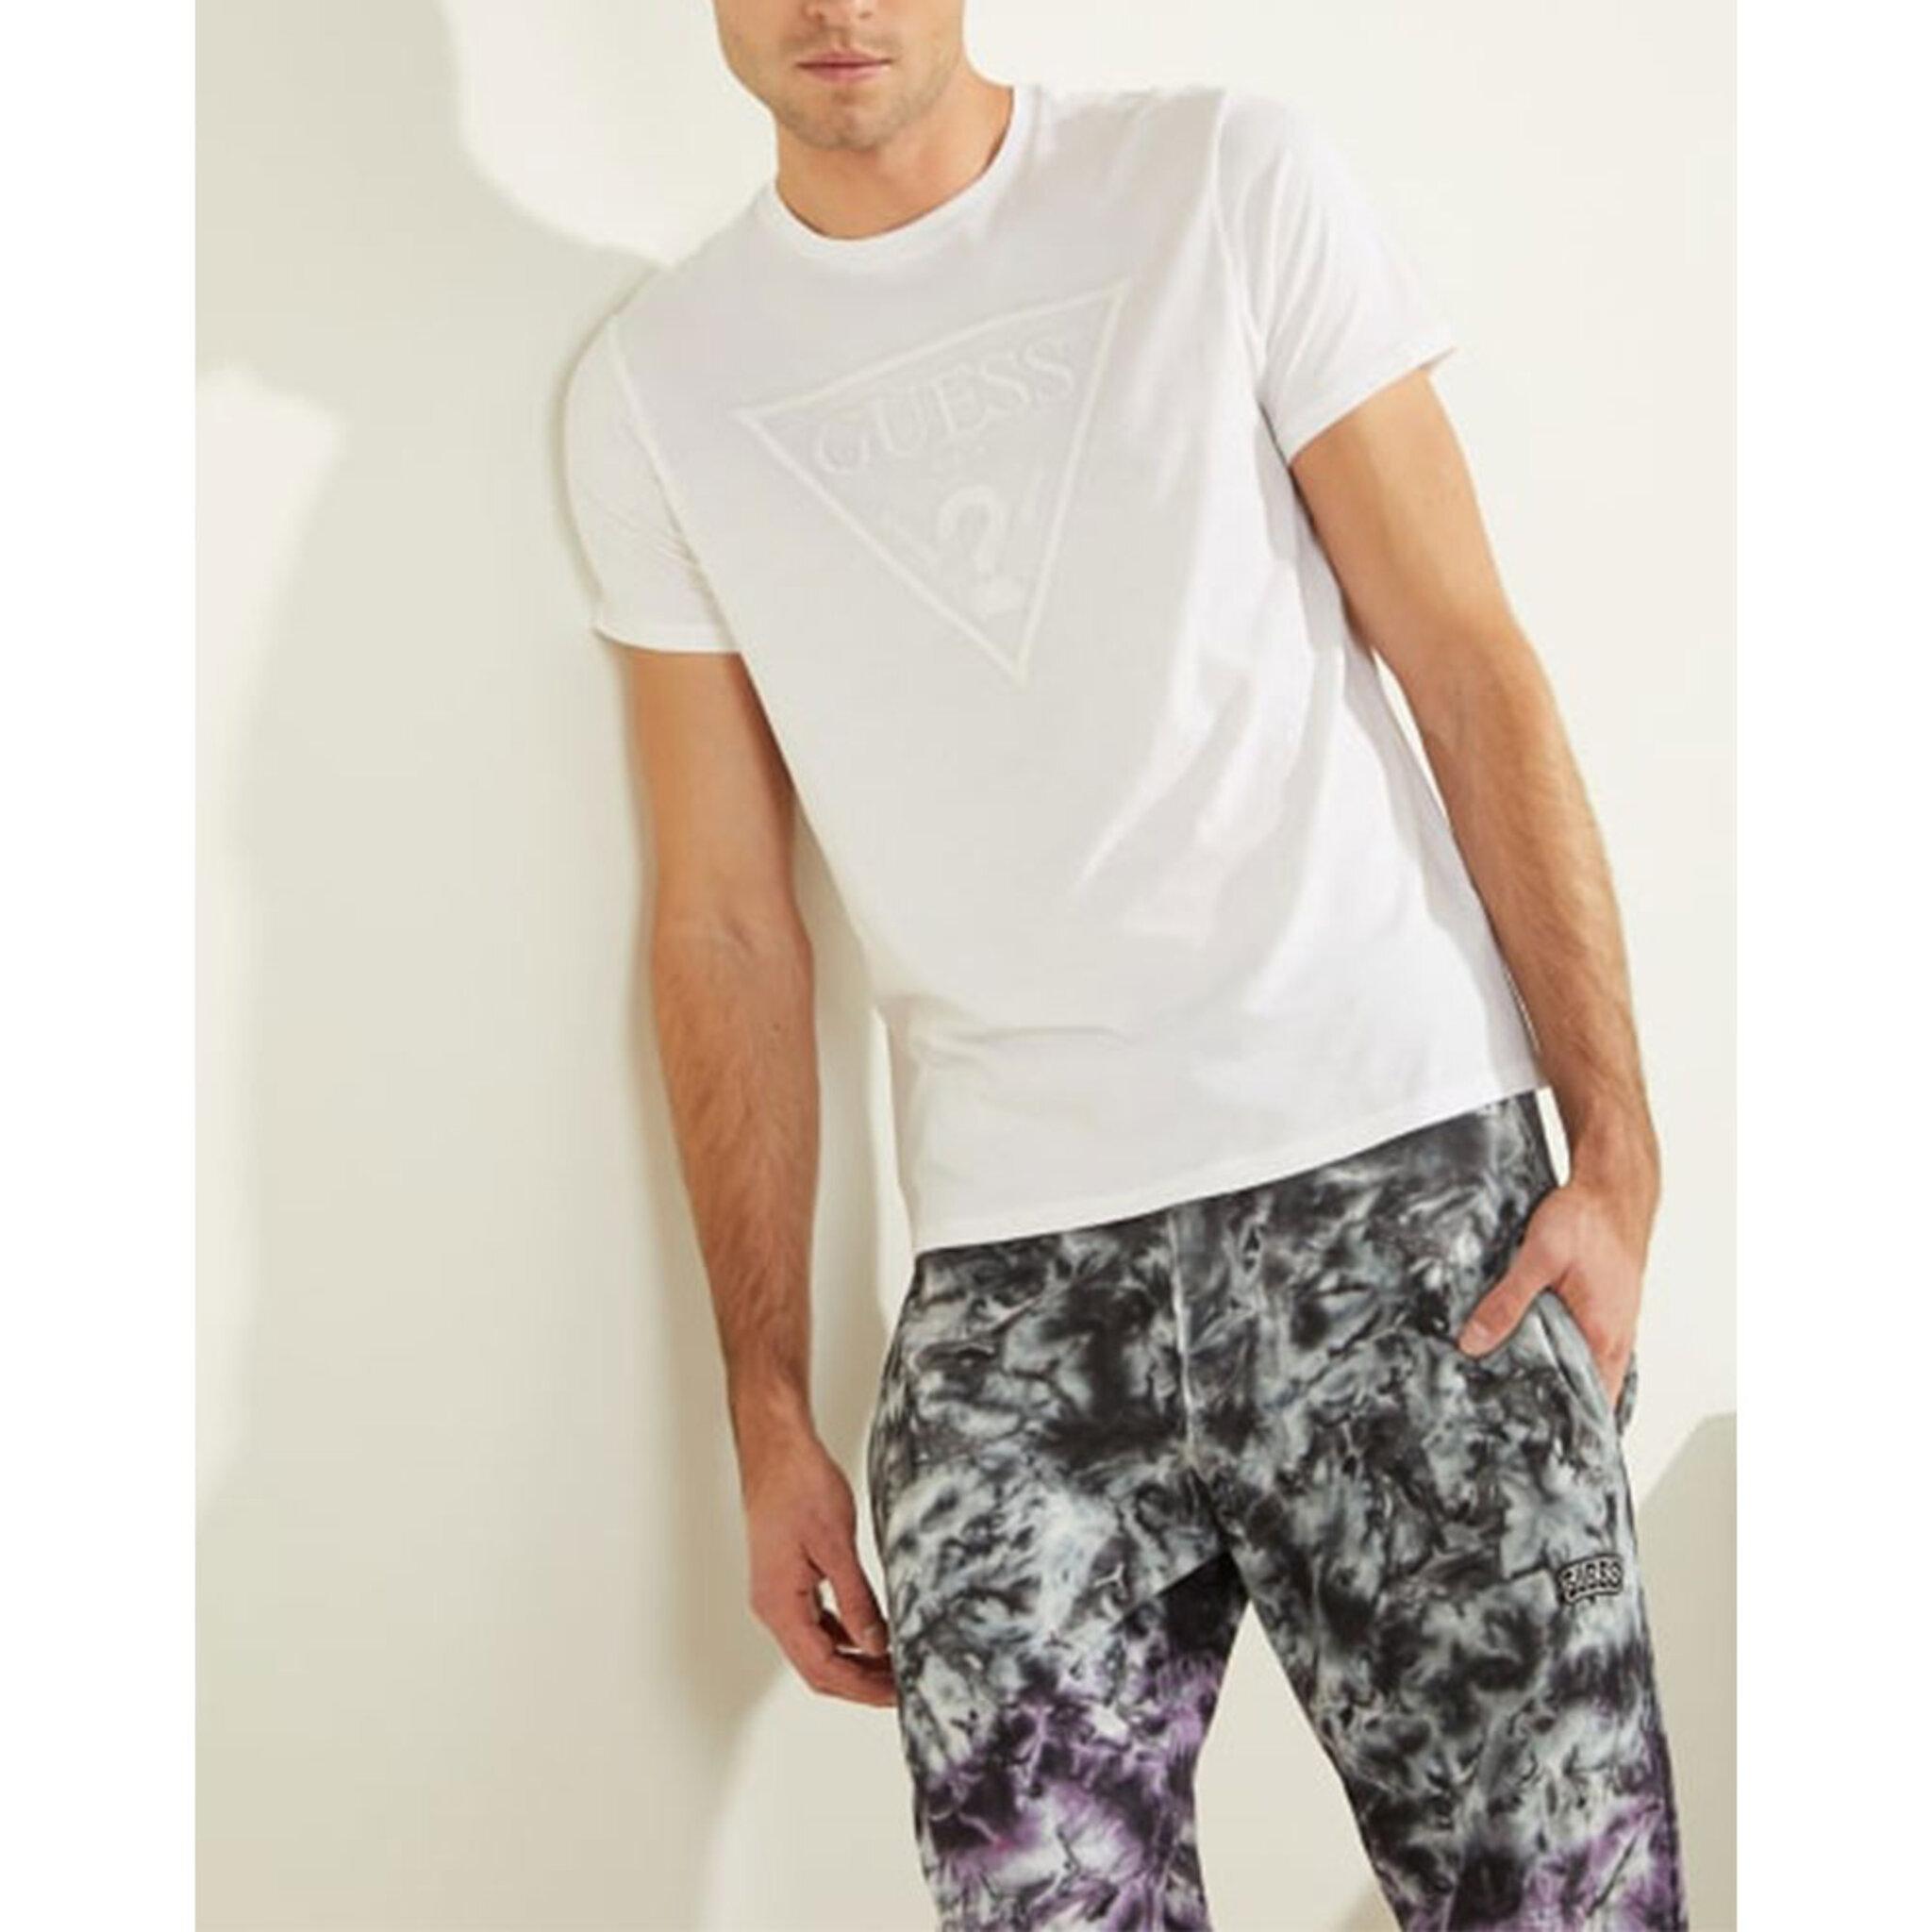 Es Ss Embroidered Logo Tshirt Short Sleeves